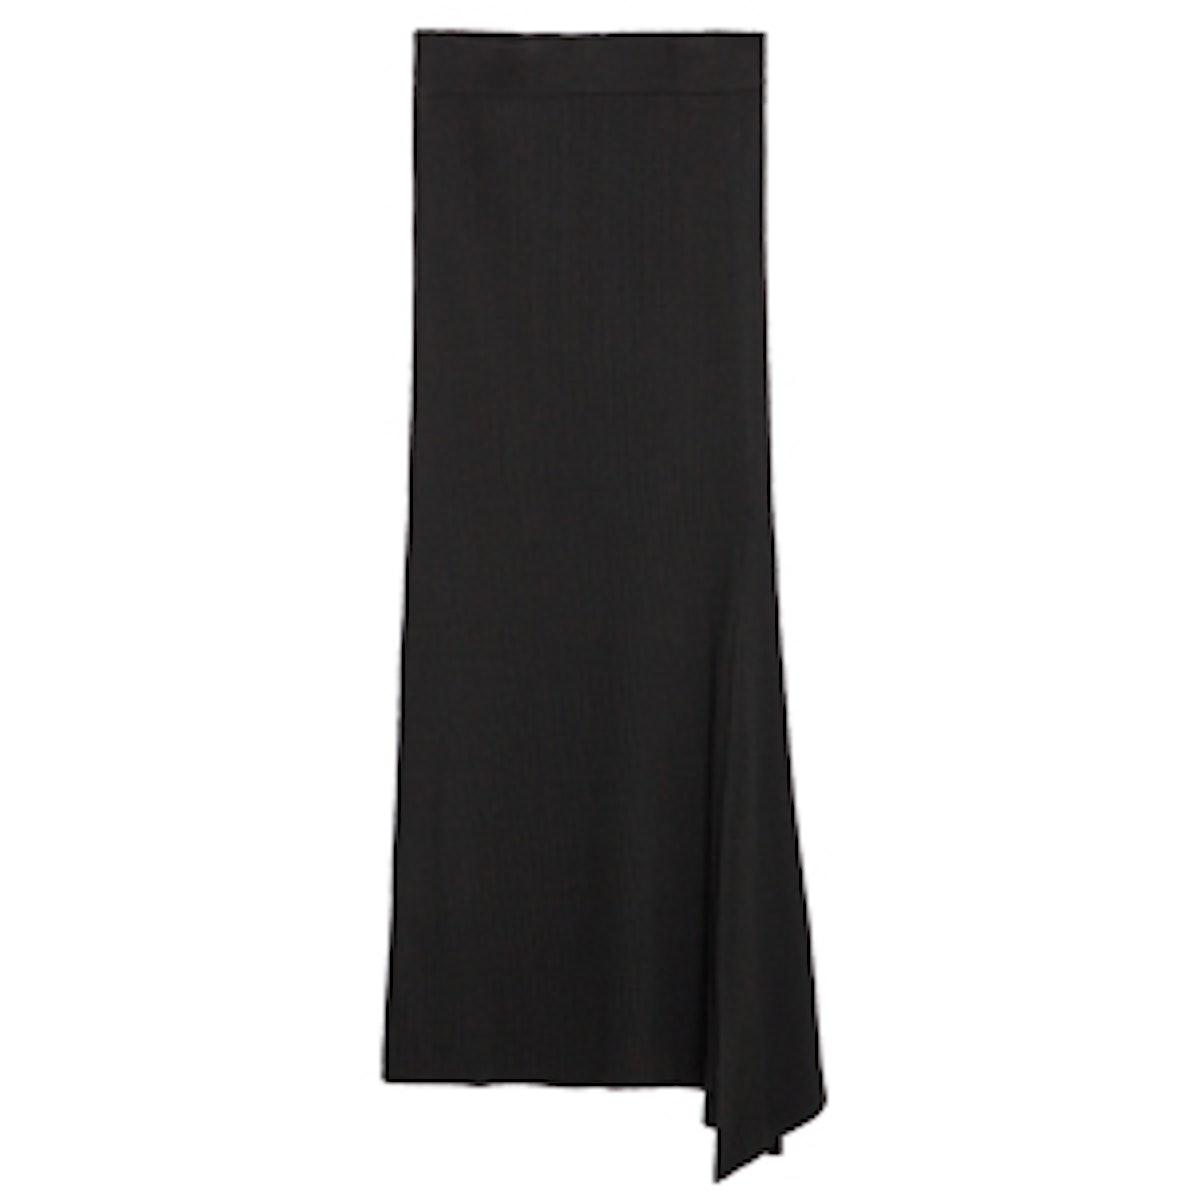 Skirt with Slit